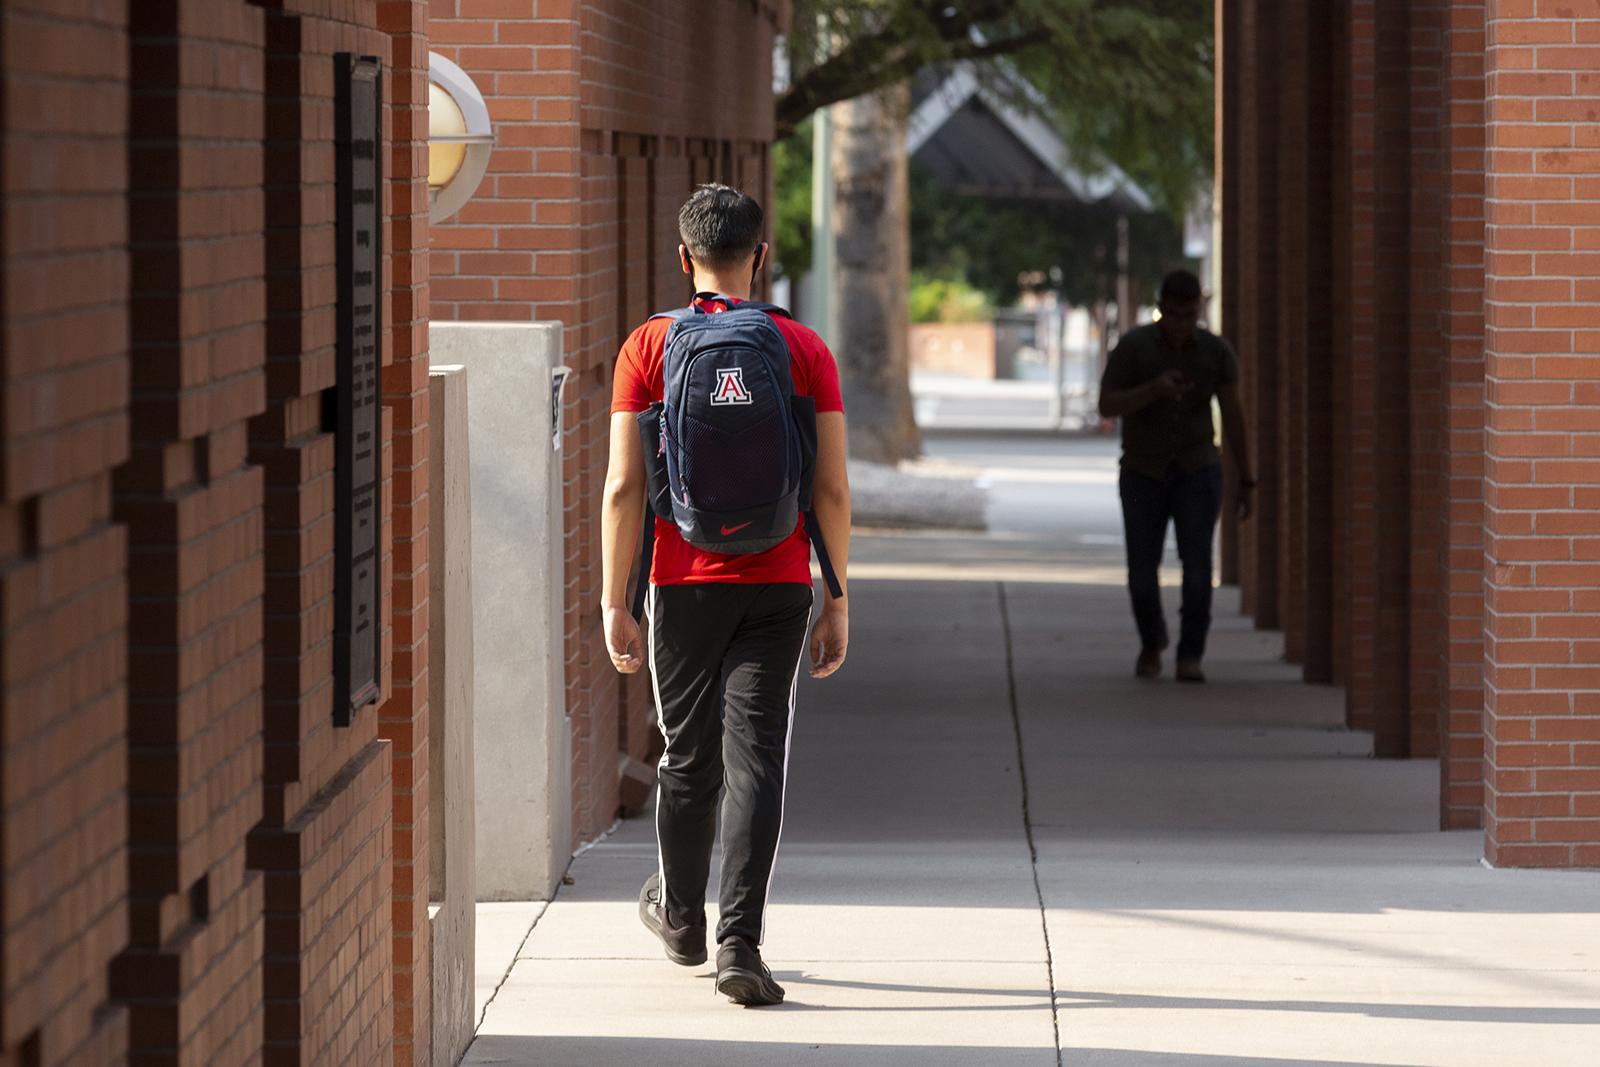 CNN:美国高校超2.5万人感染新冠病毒 - 原创 - 海外网